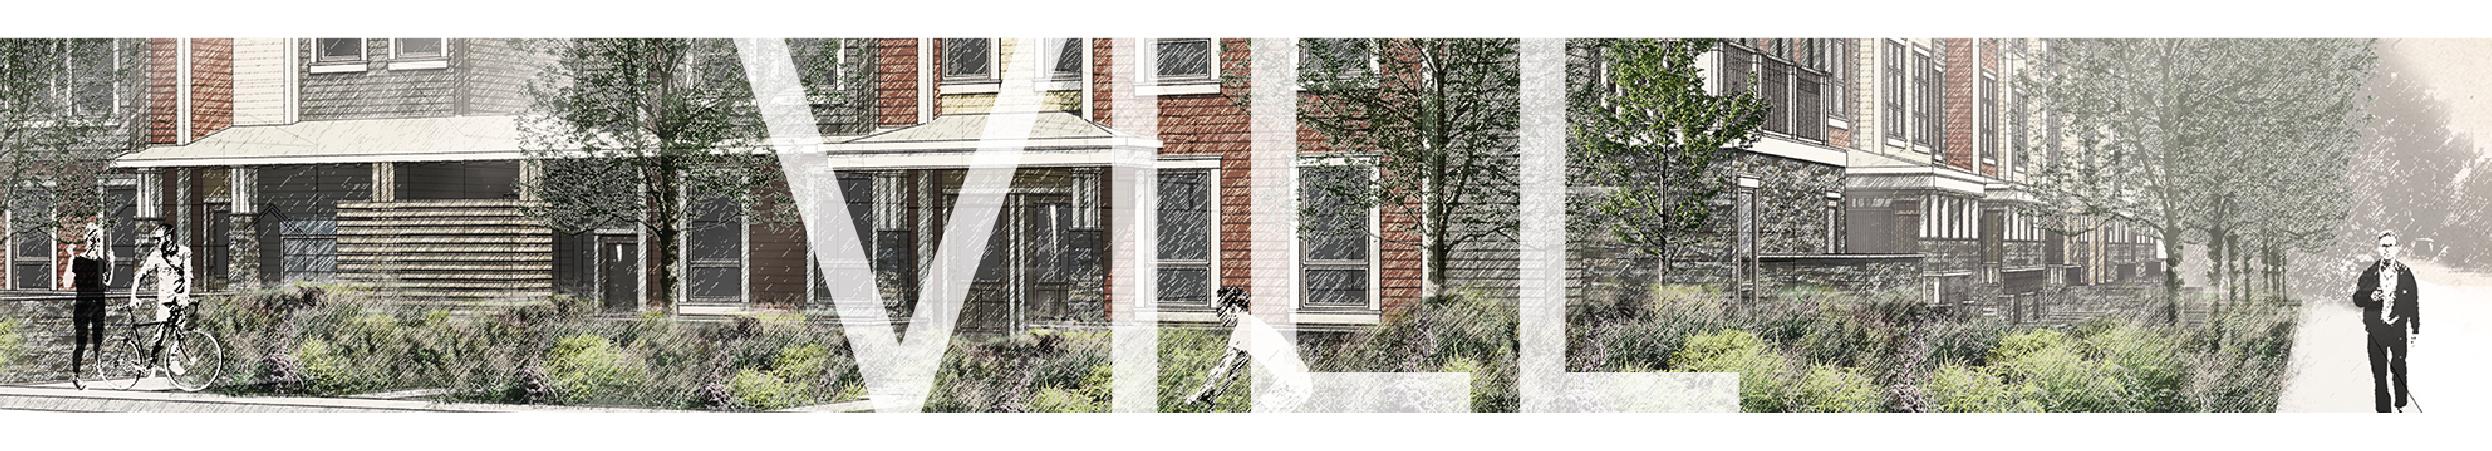 Project Tiles-07.jpg